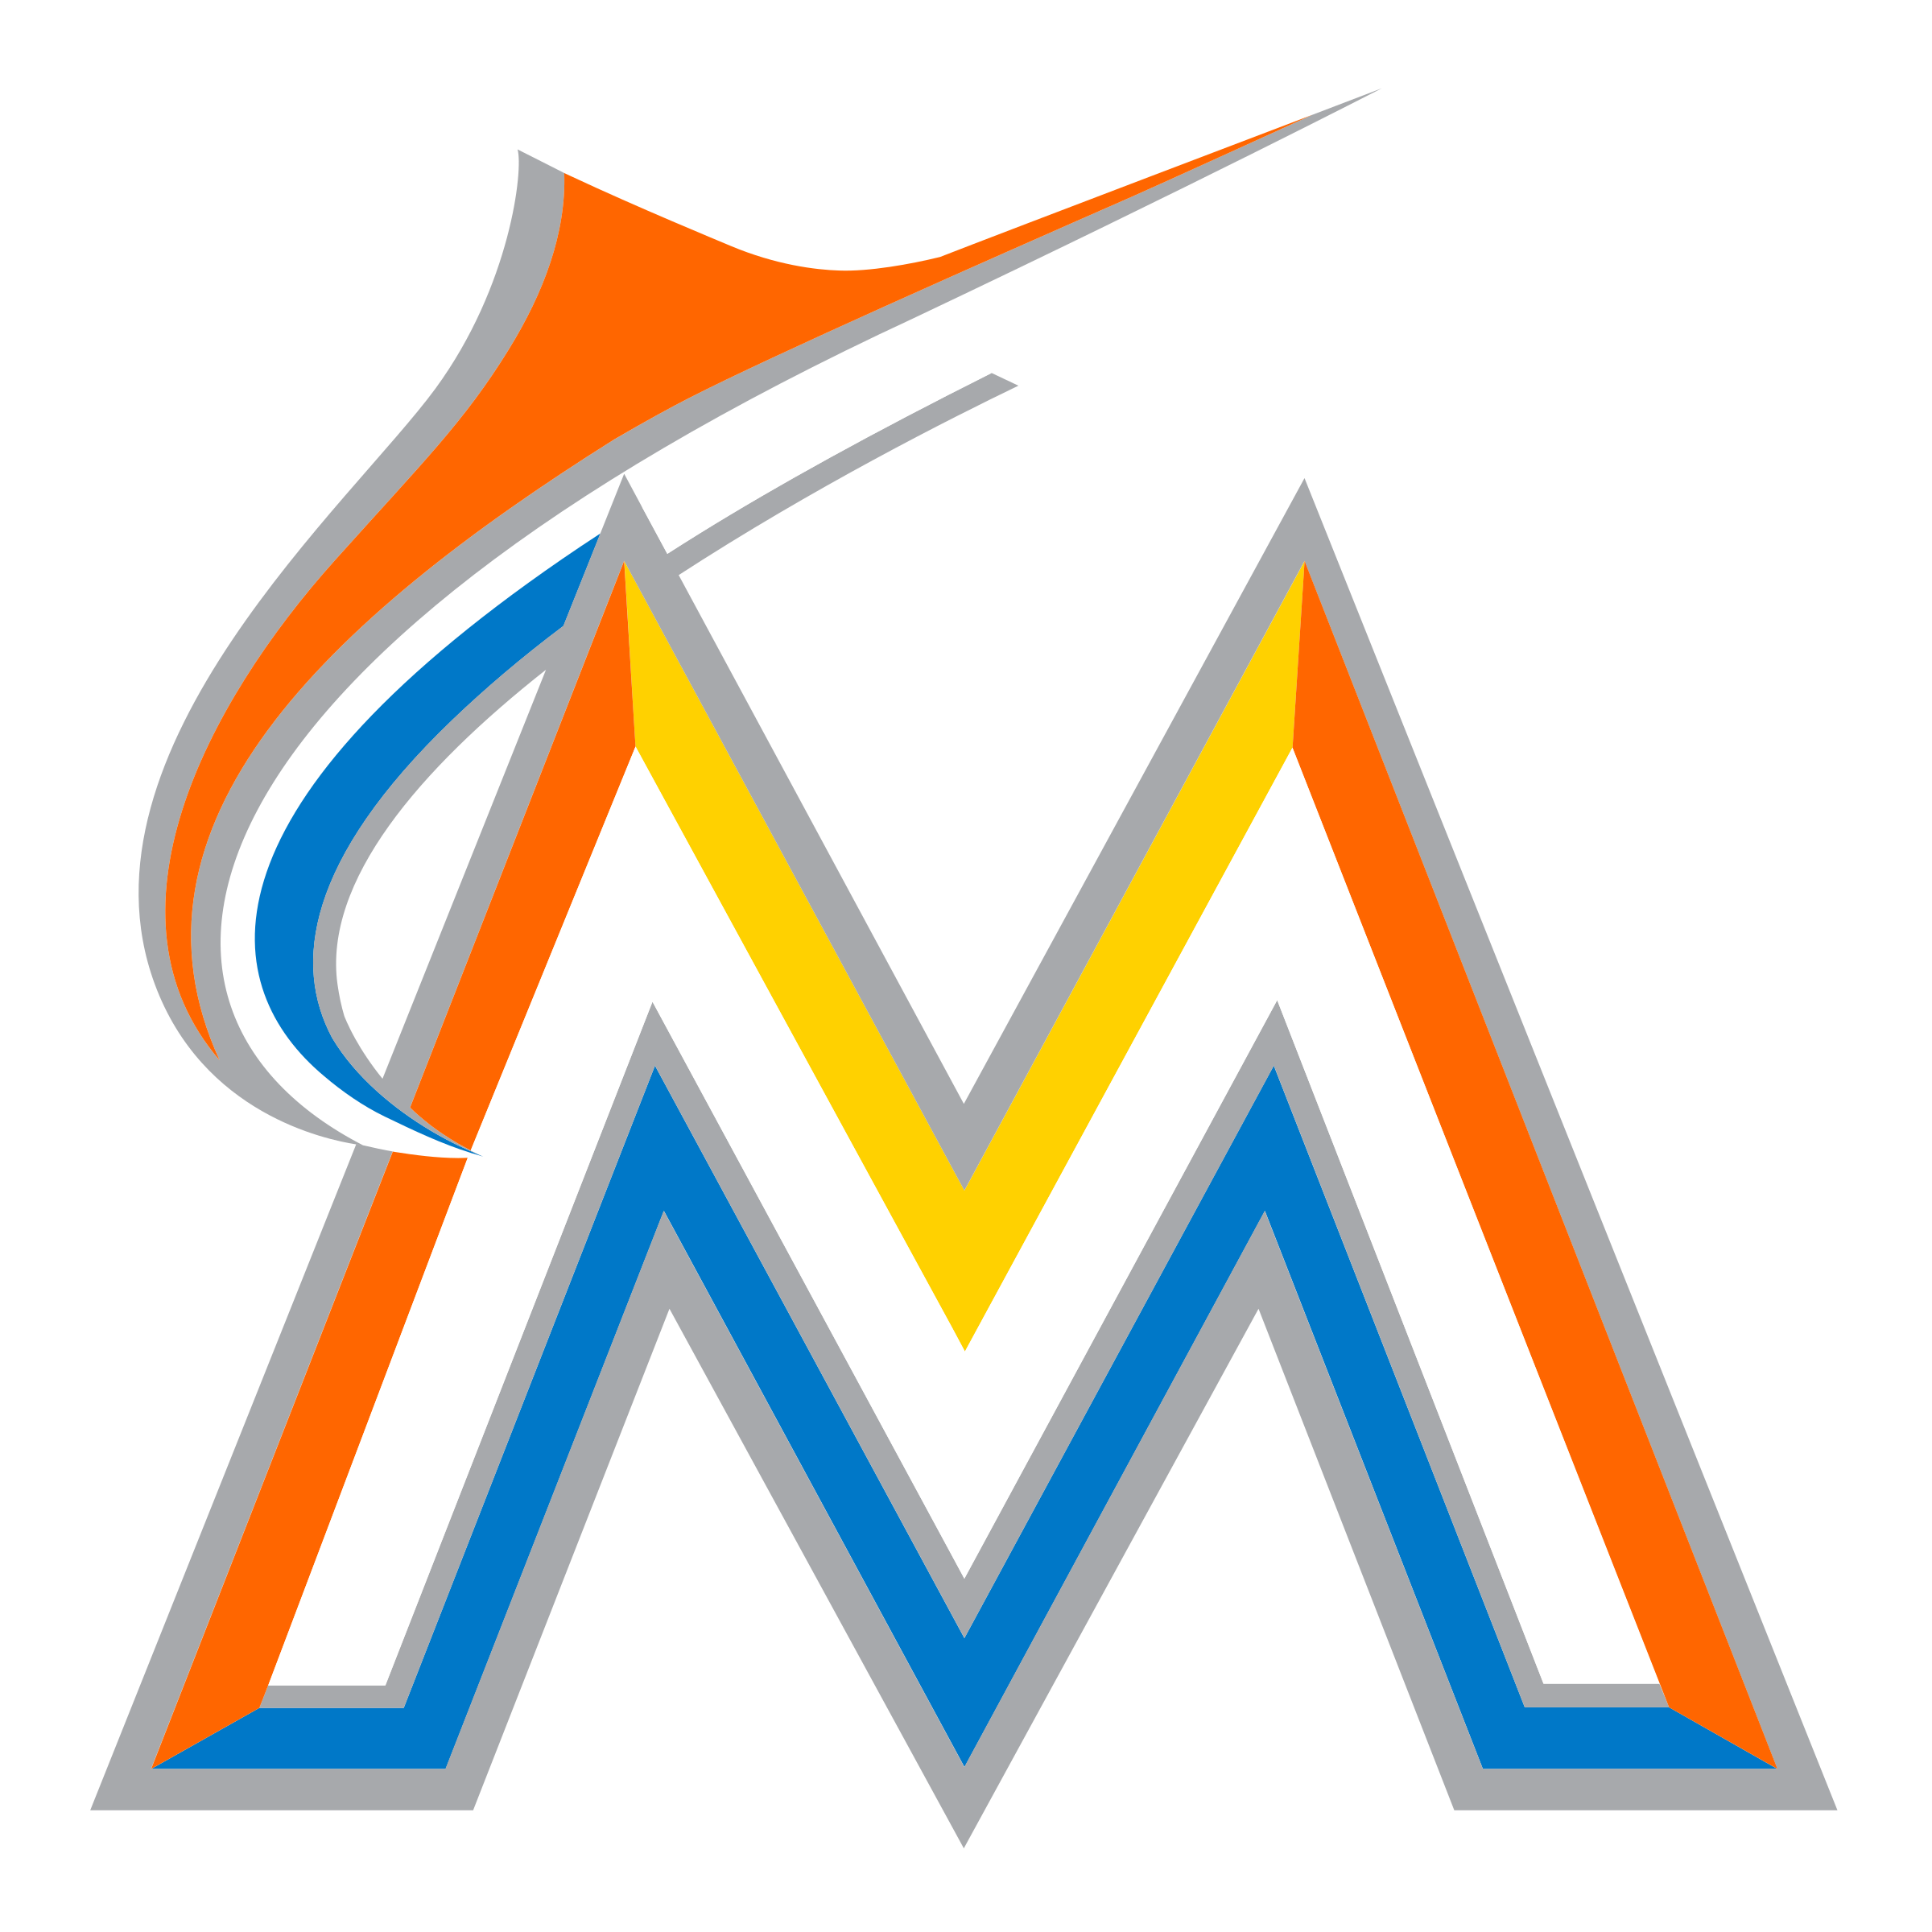 Miami Marlins Logo PNG Image.